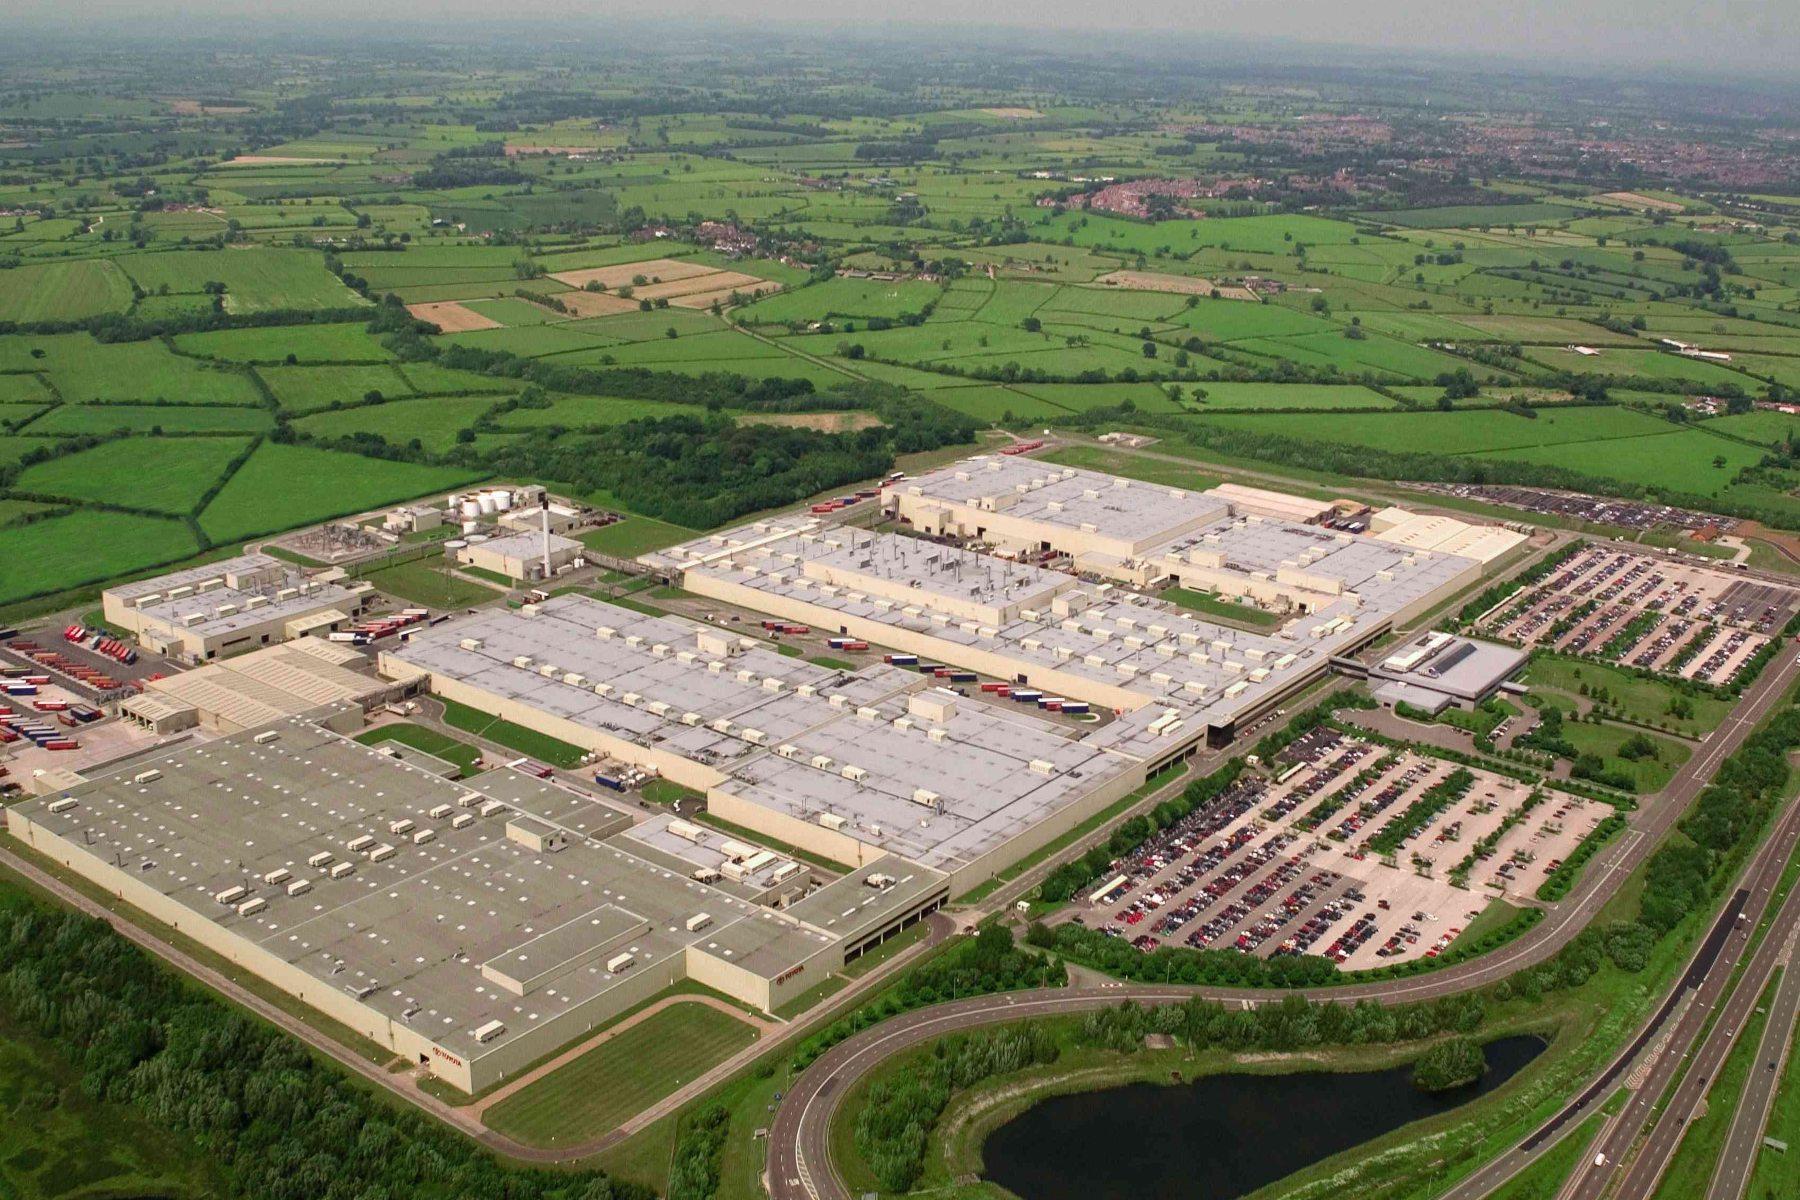 Toyota's TMUK plant in Burnaston, Derbyshire